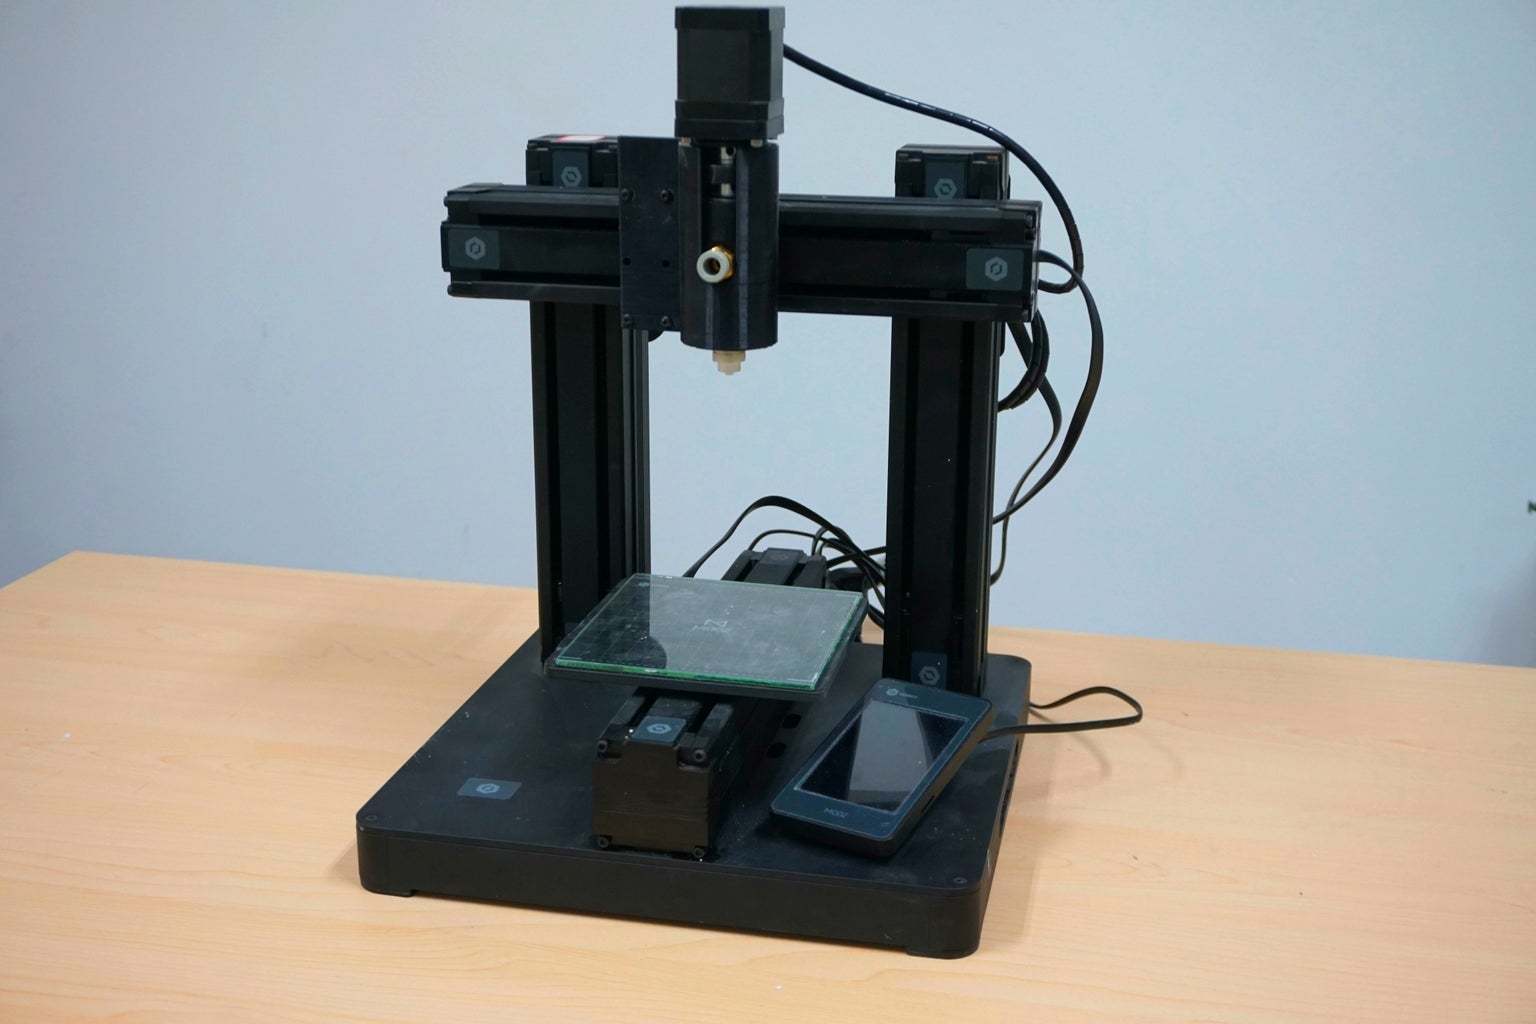 How to Convert a FDM 3D Printer to a Clay 3D Printer